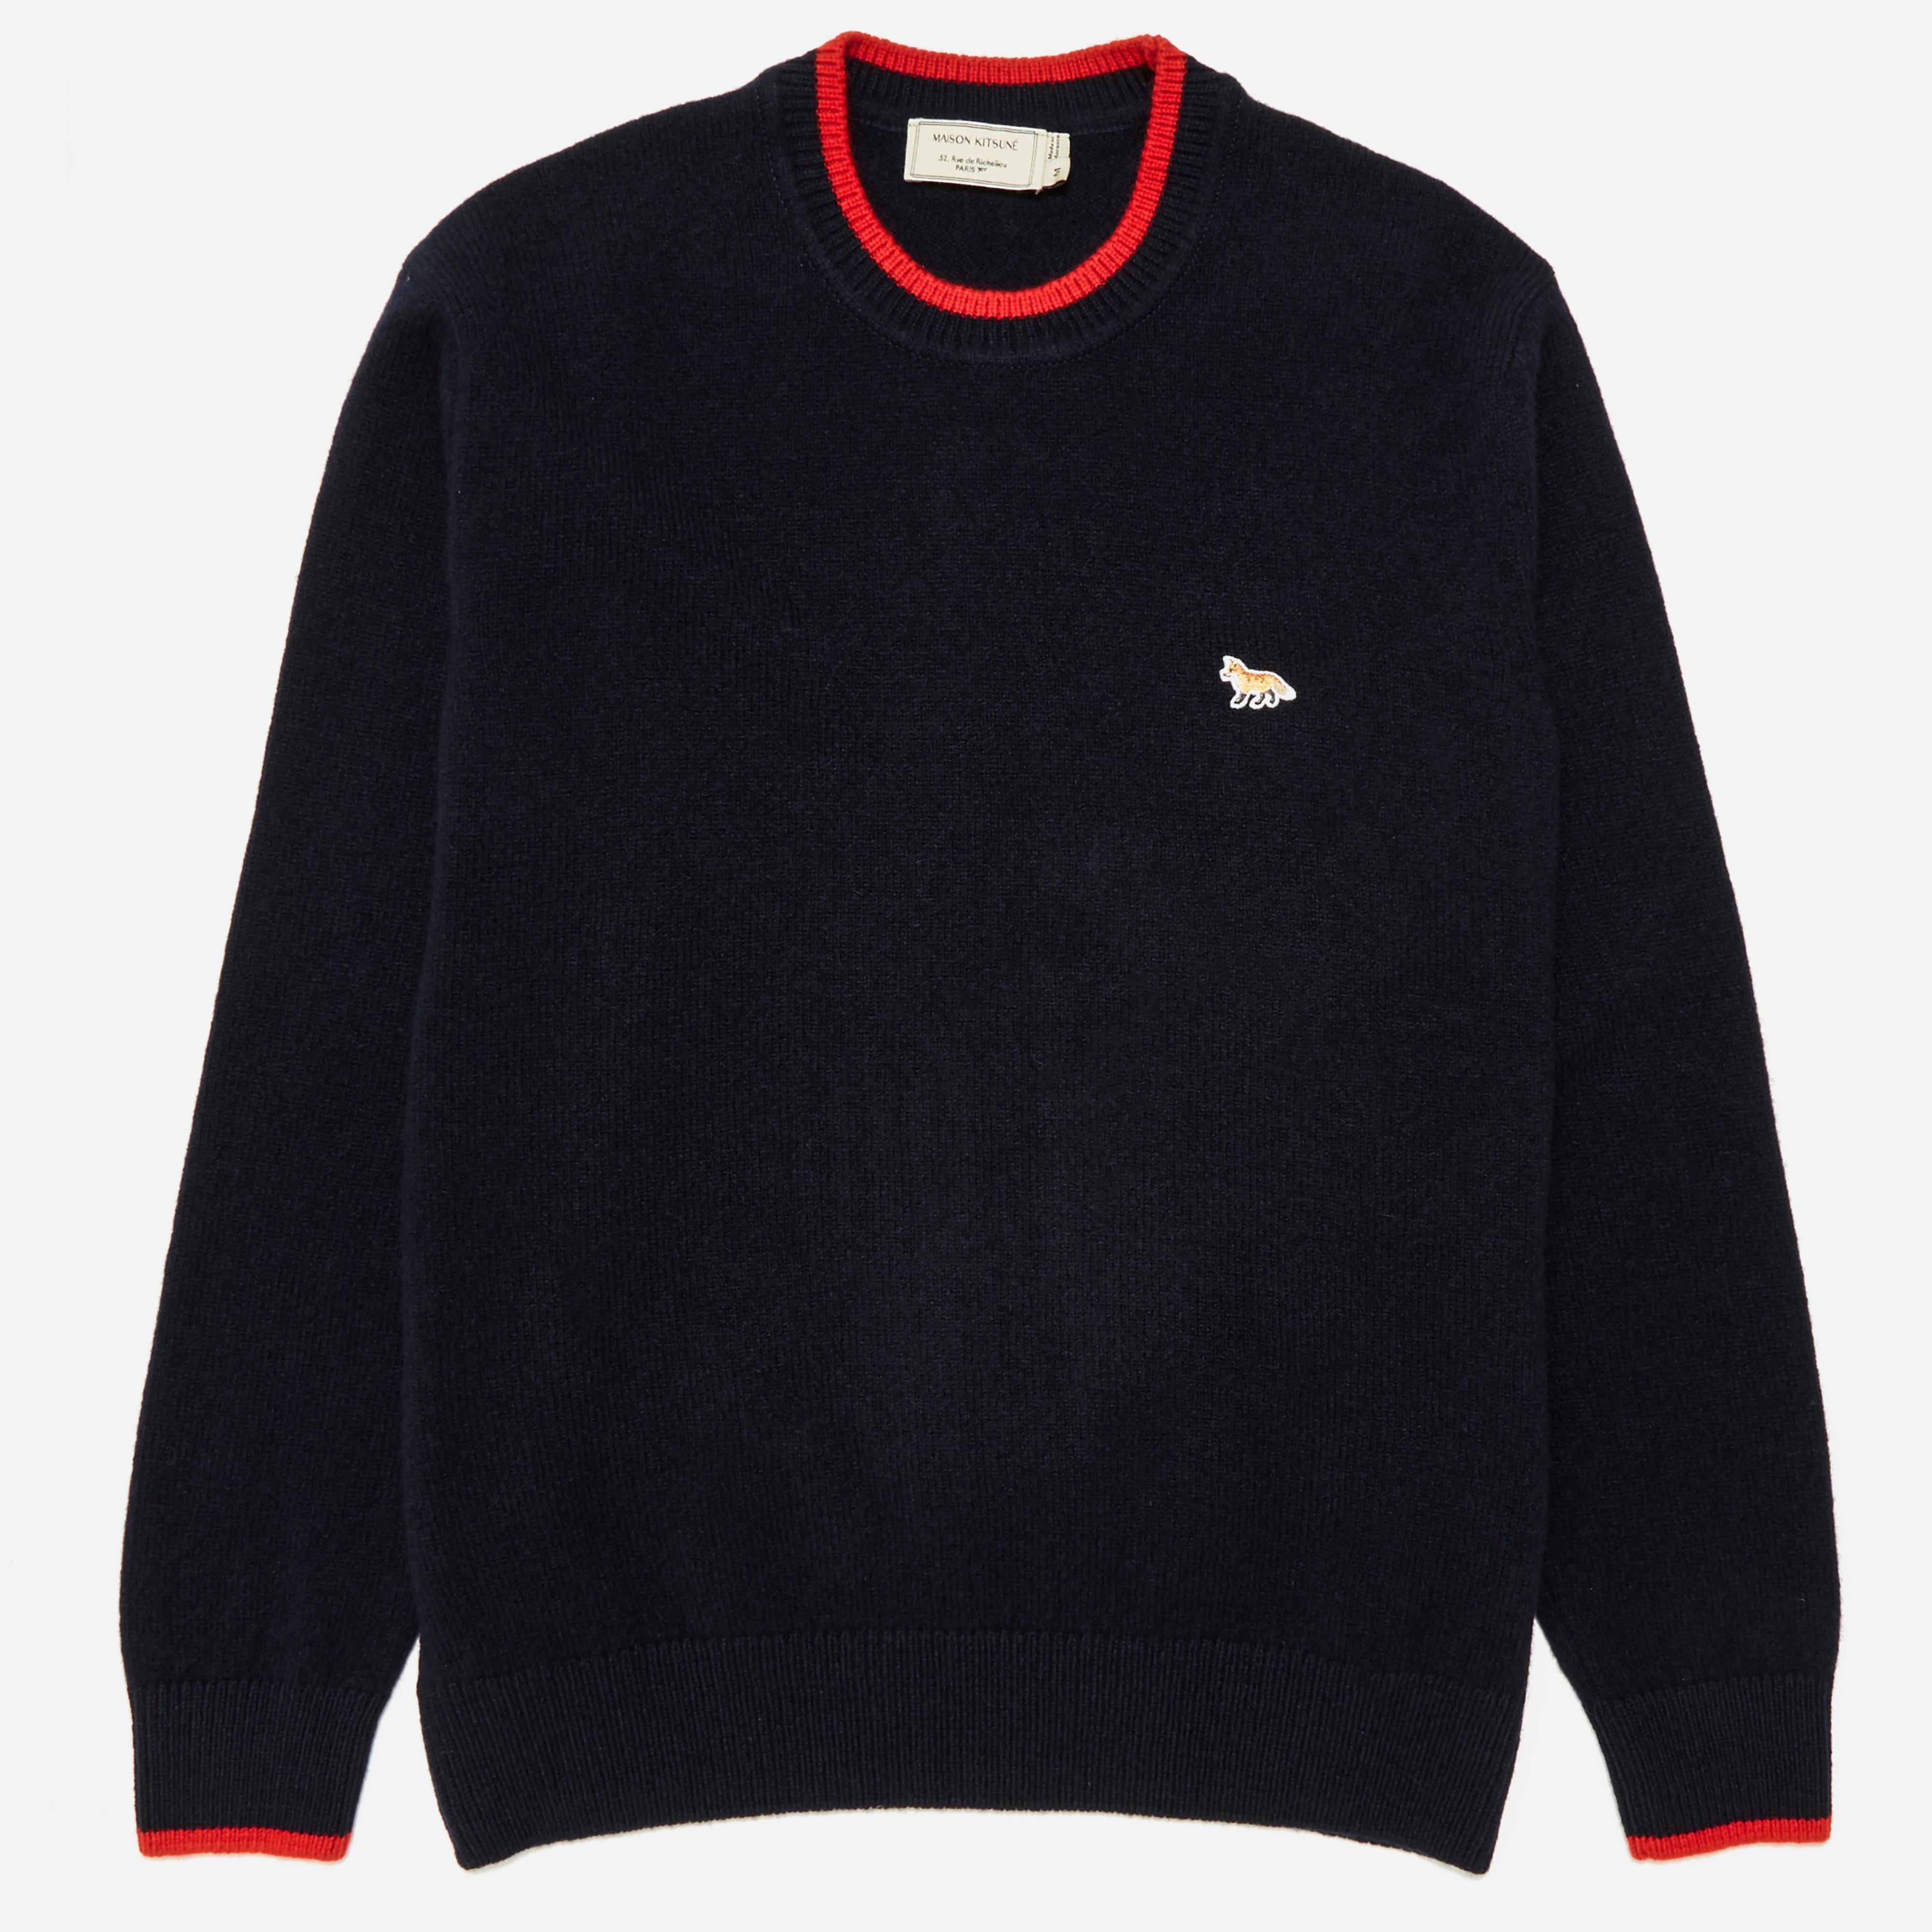 Maison Kitsune Lambswool R Neck Knit